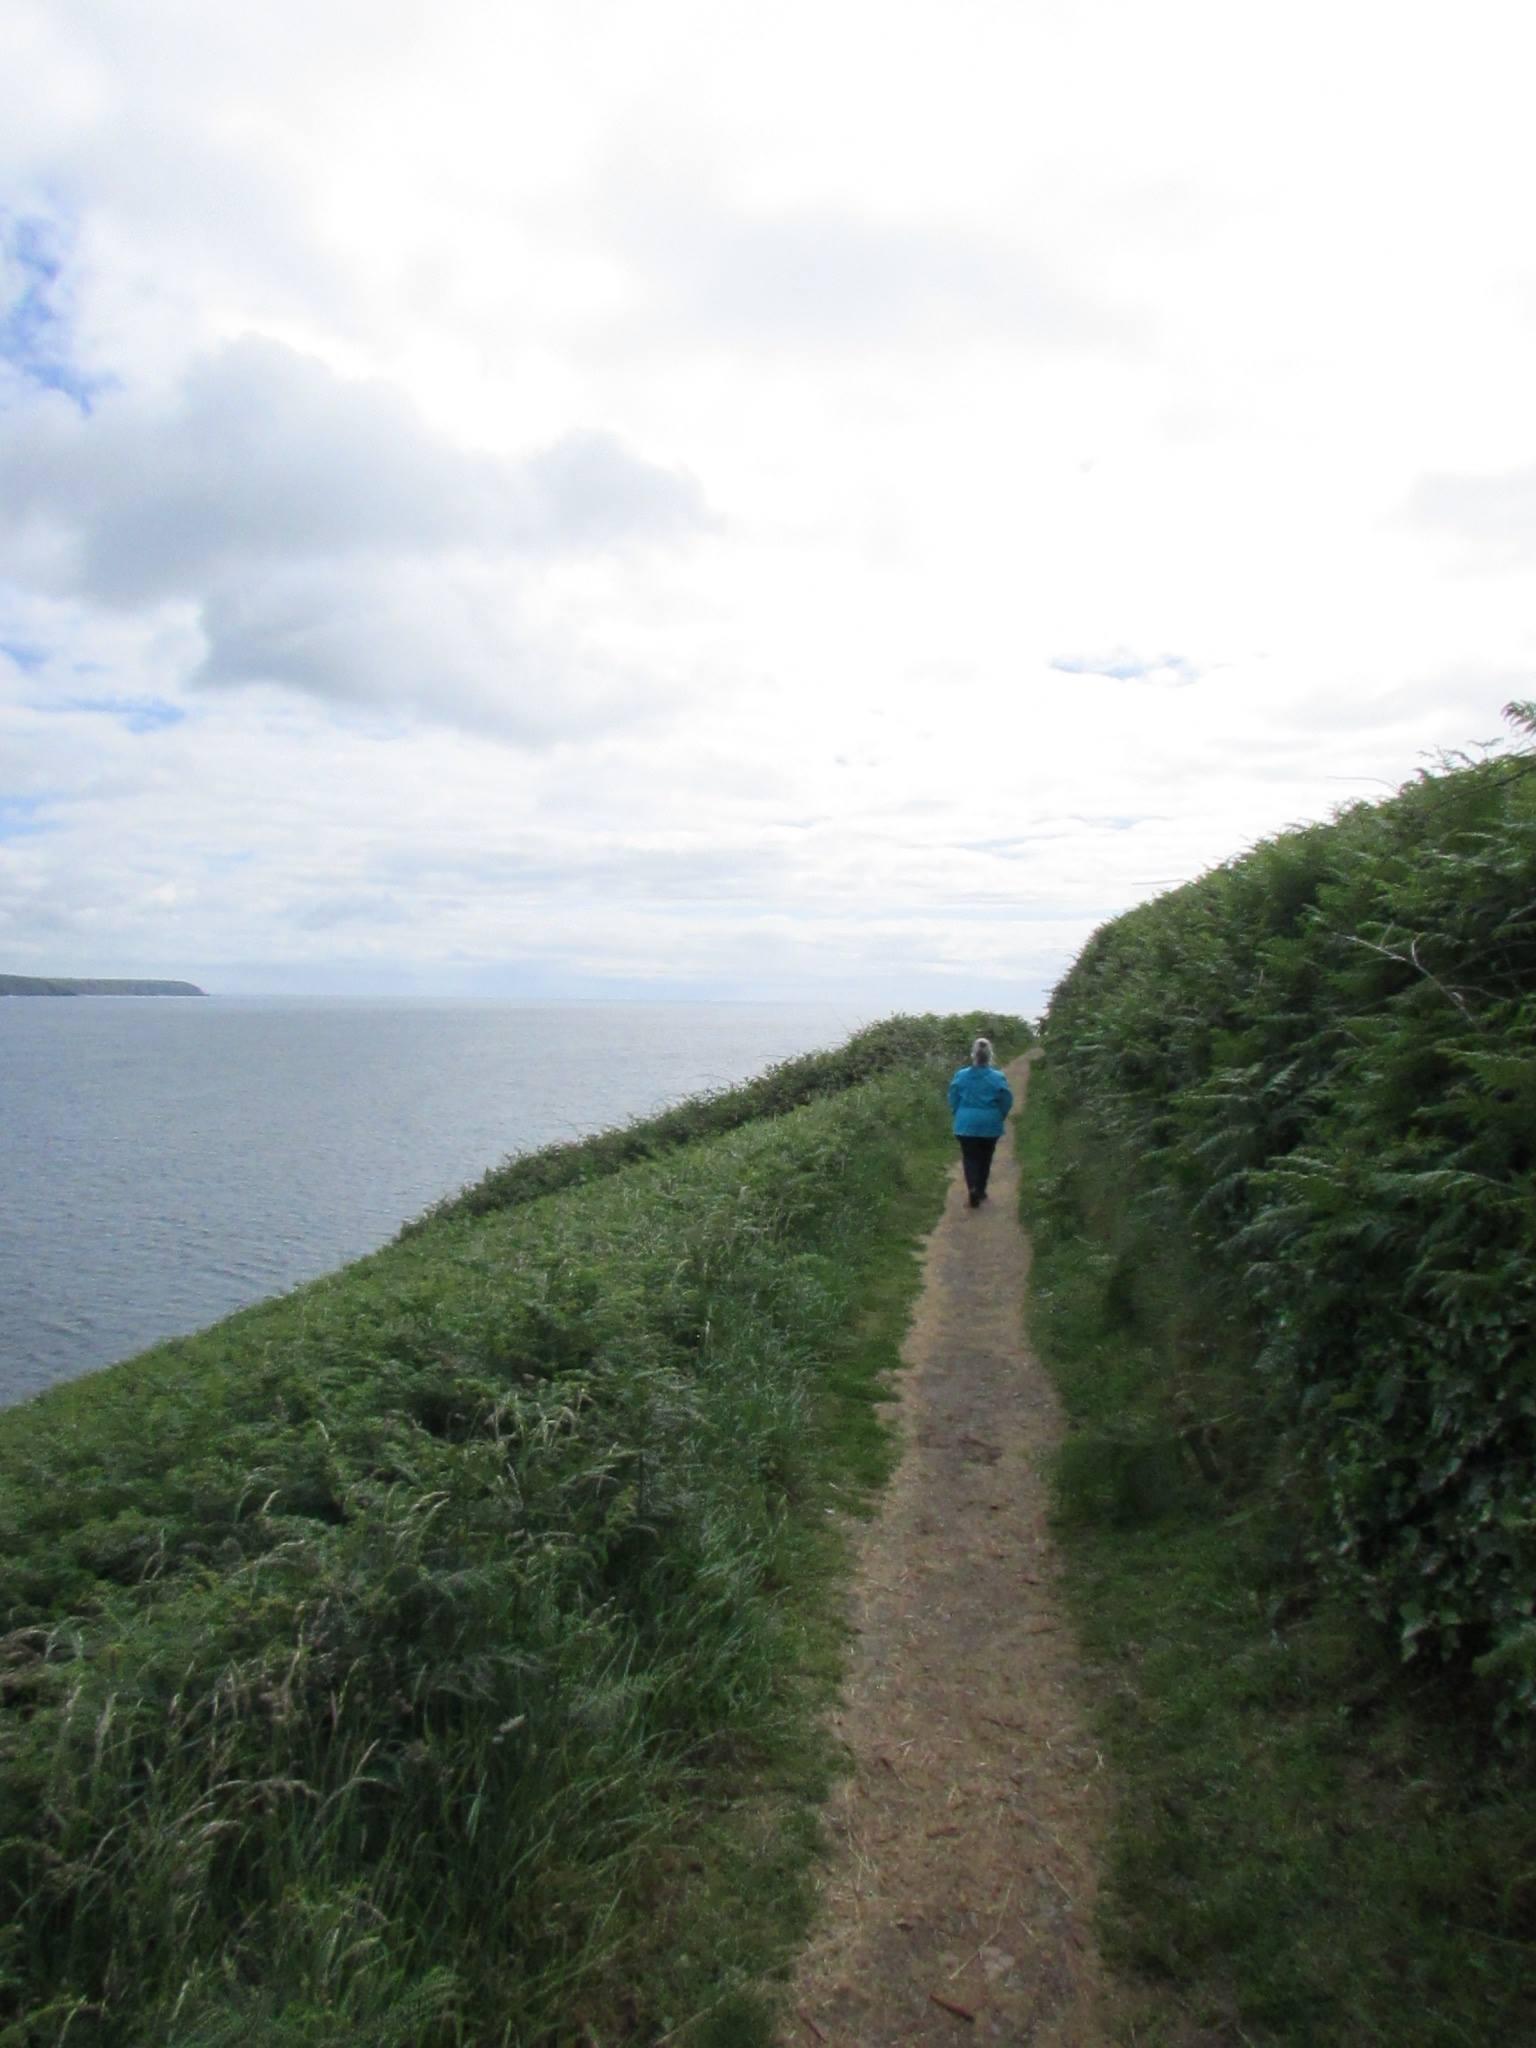 Summer 2016 - St. Declan's Way, Ardmore Peninsual, Co. Waterford, IRELAND